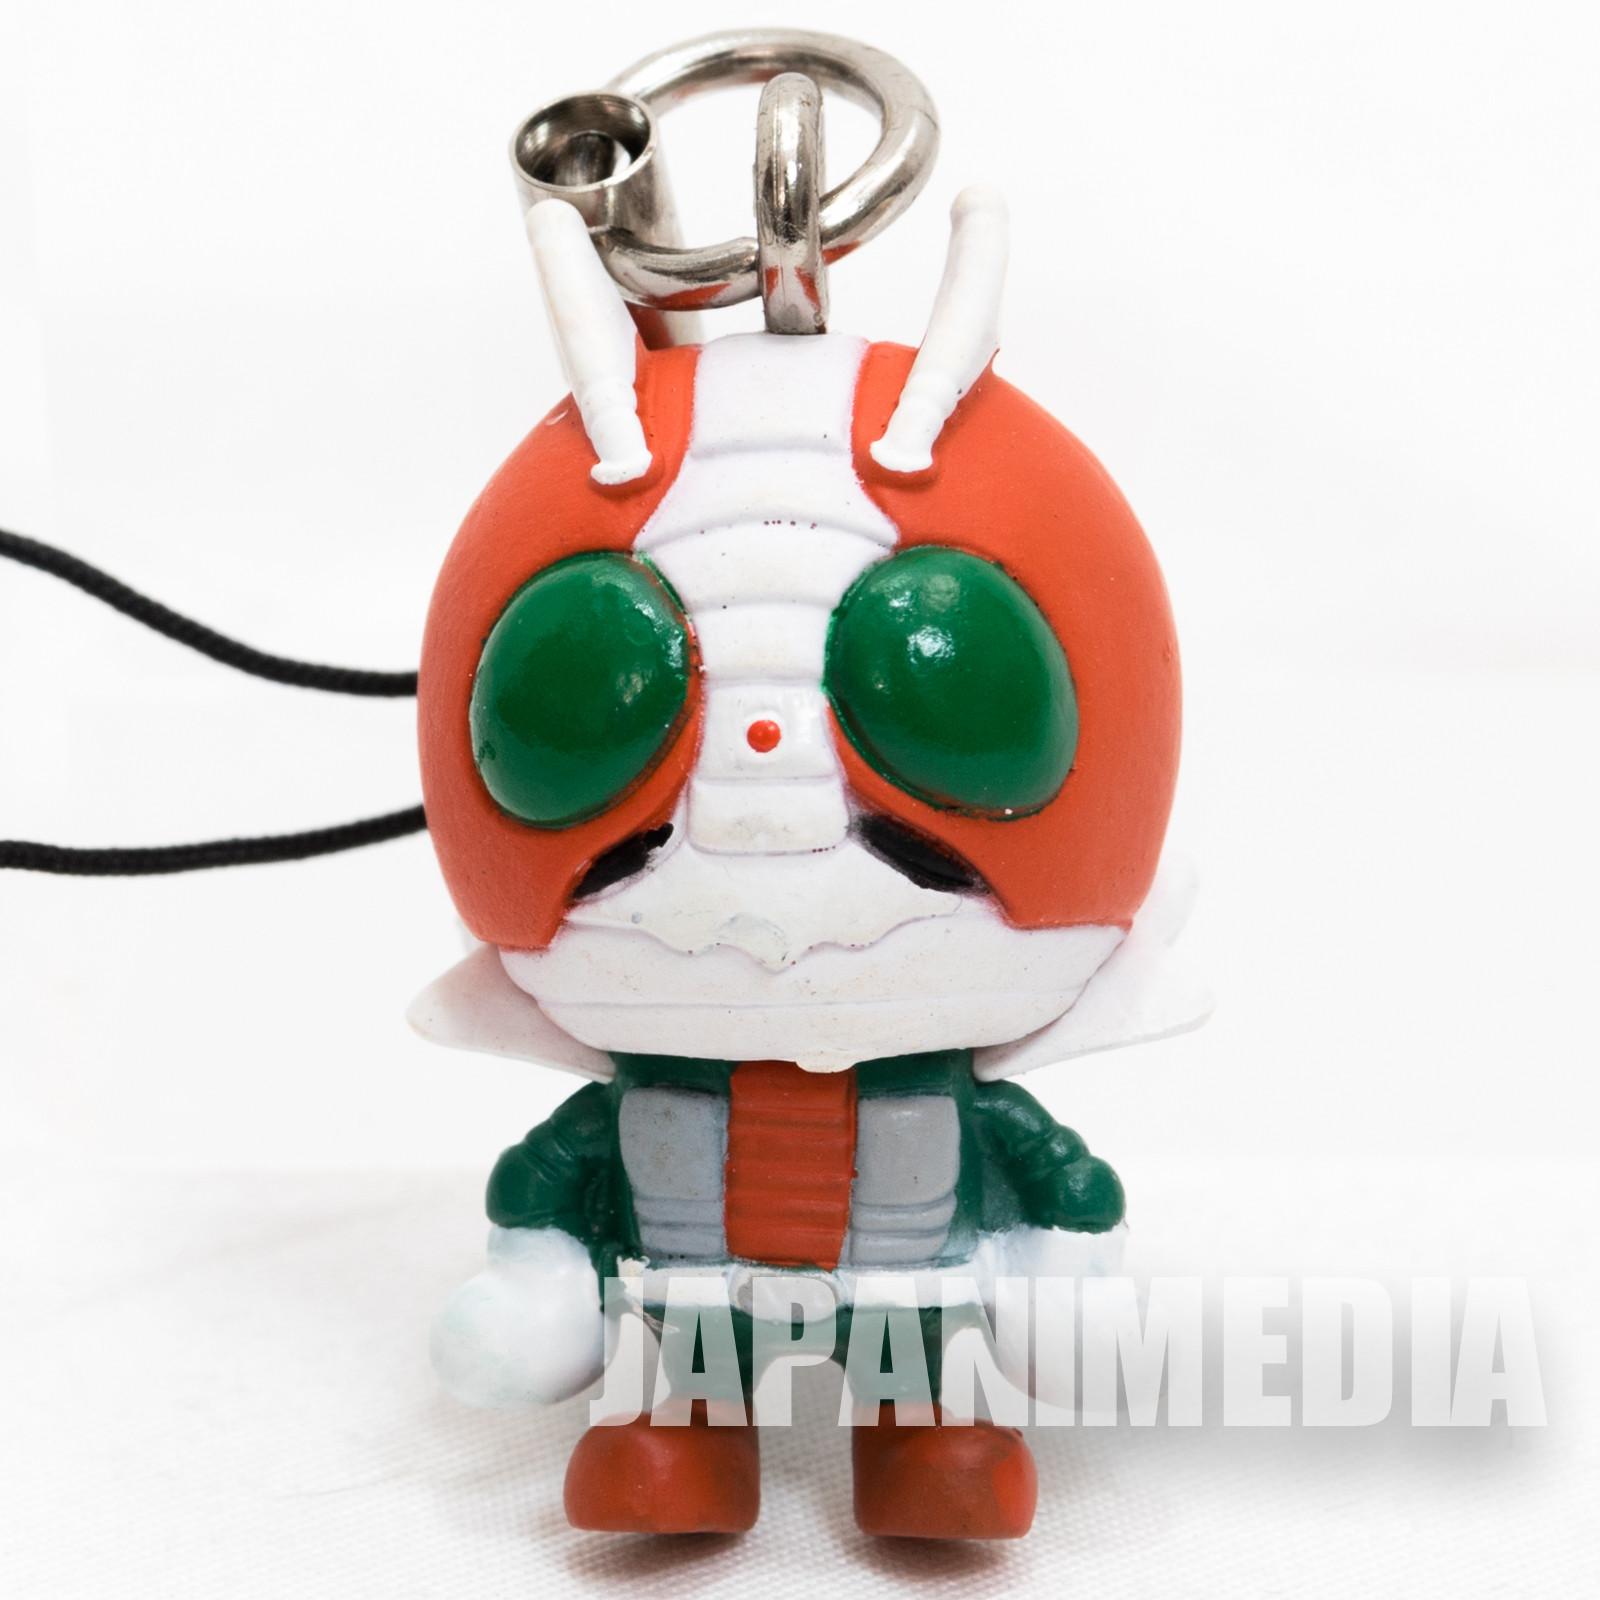 Masked Kamen Rider V3 x Panson Works Figure Strap Shotaro Ishinomori Characters